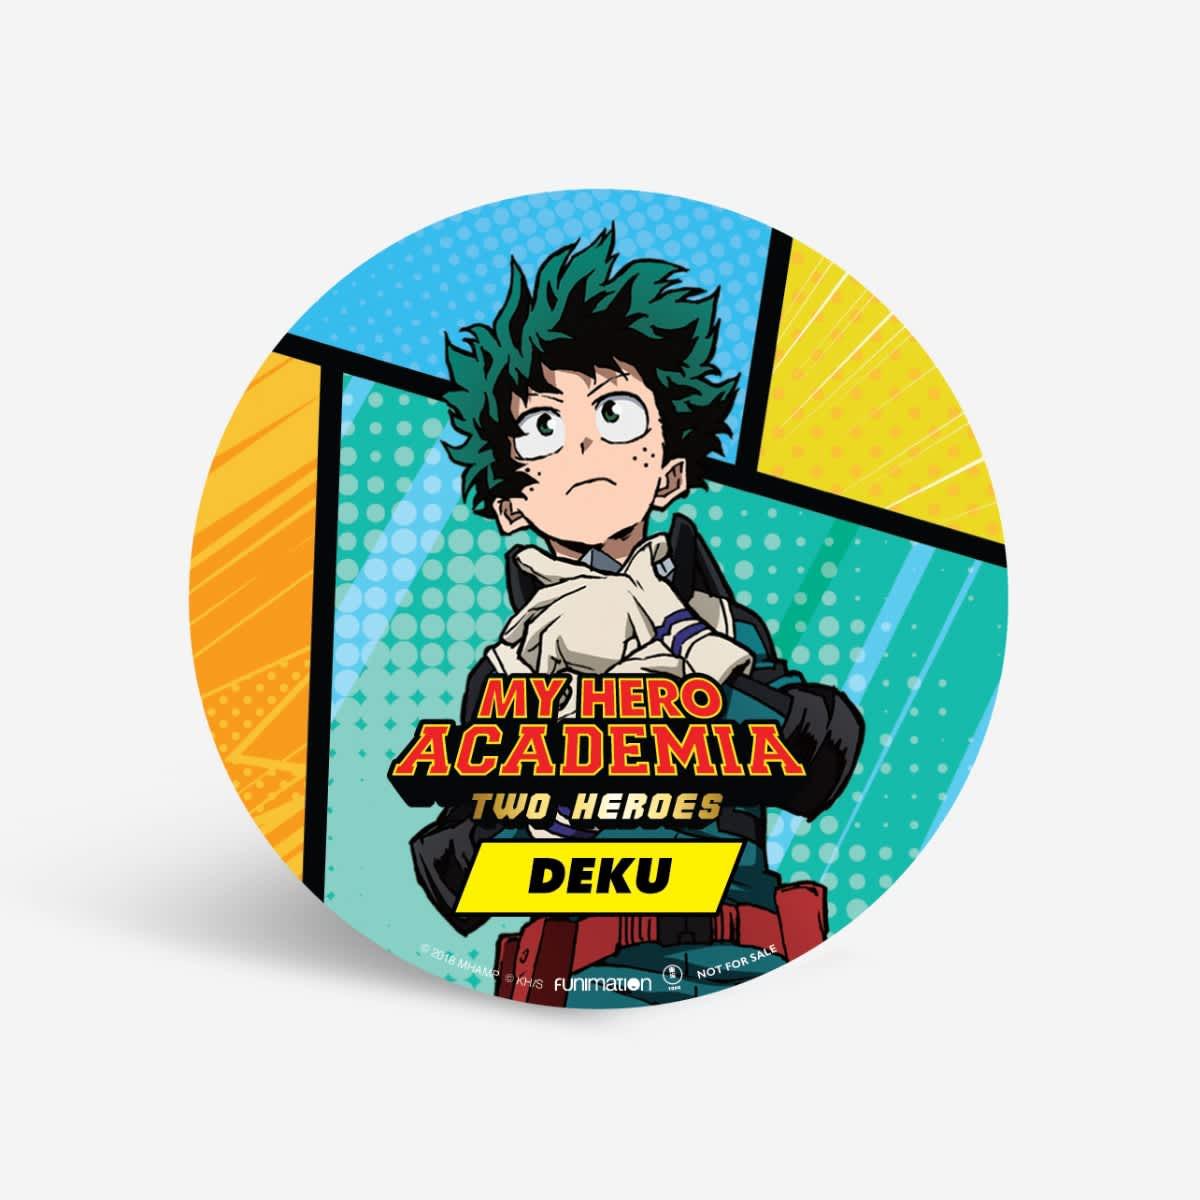 boku no hero academia movie torrent